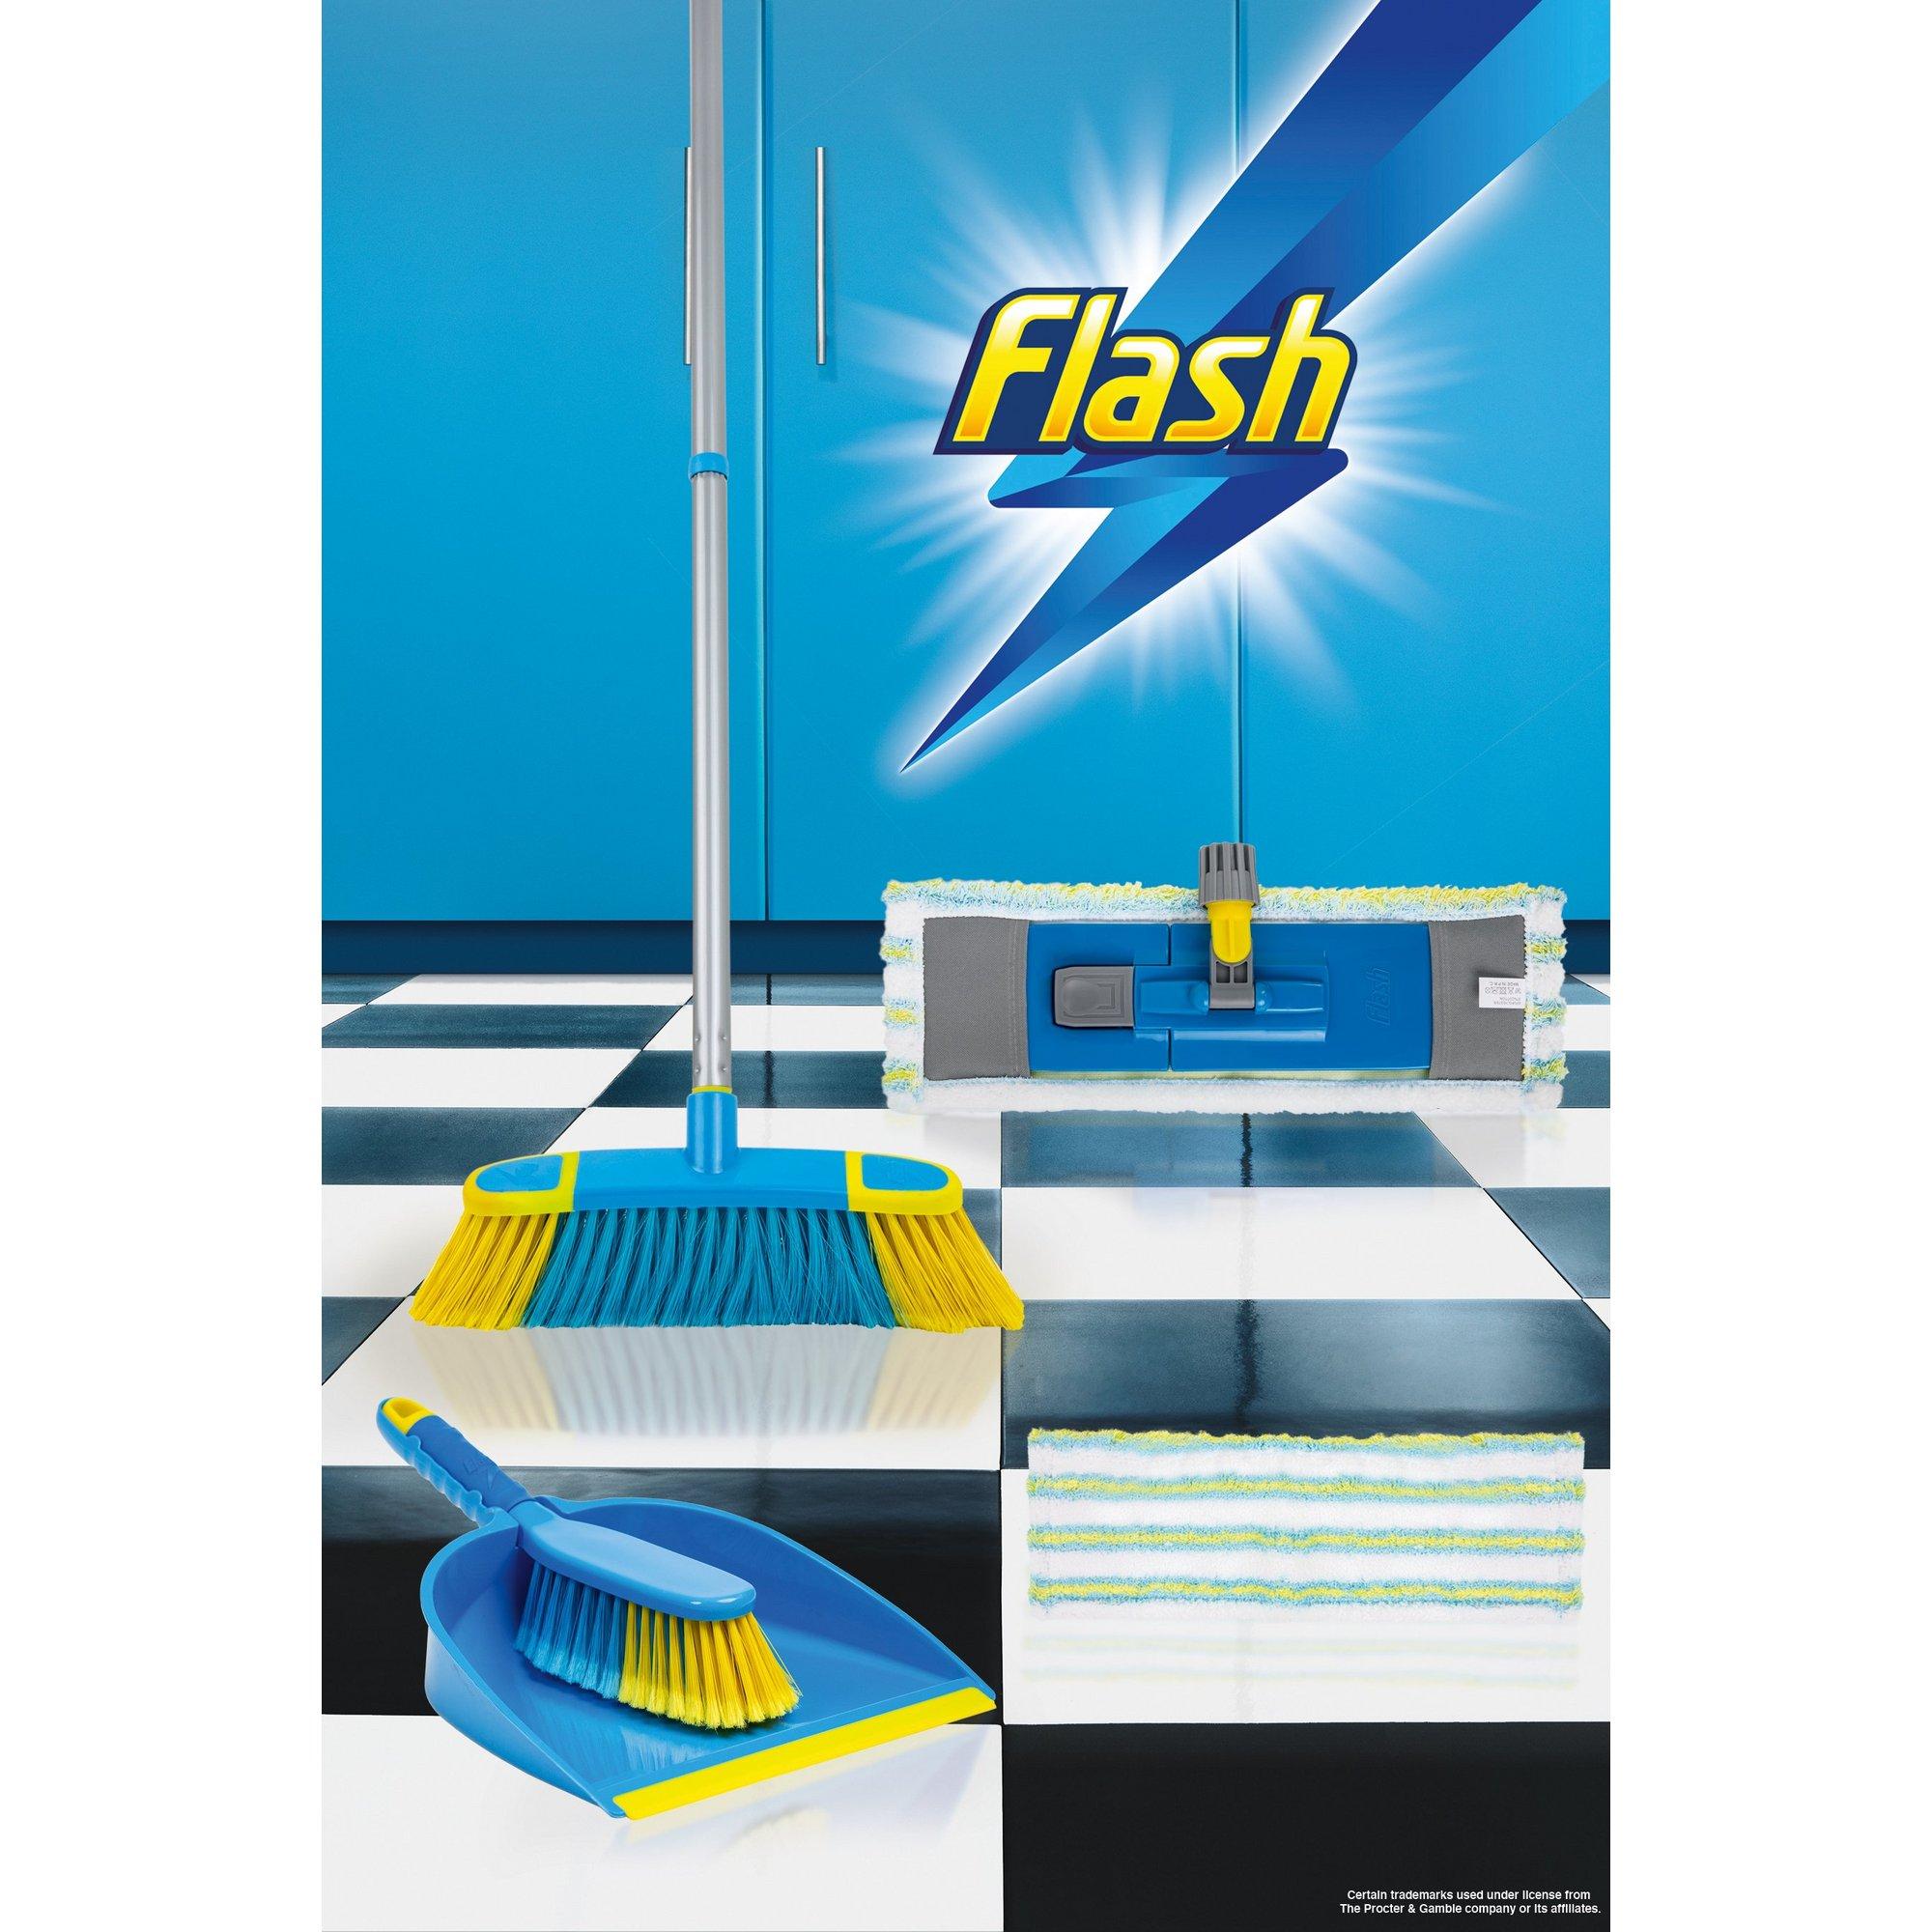 Image of Flash Flat Mop Cleaning Kit